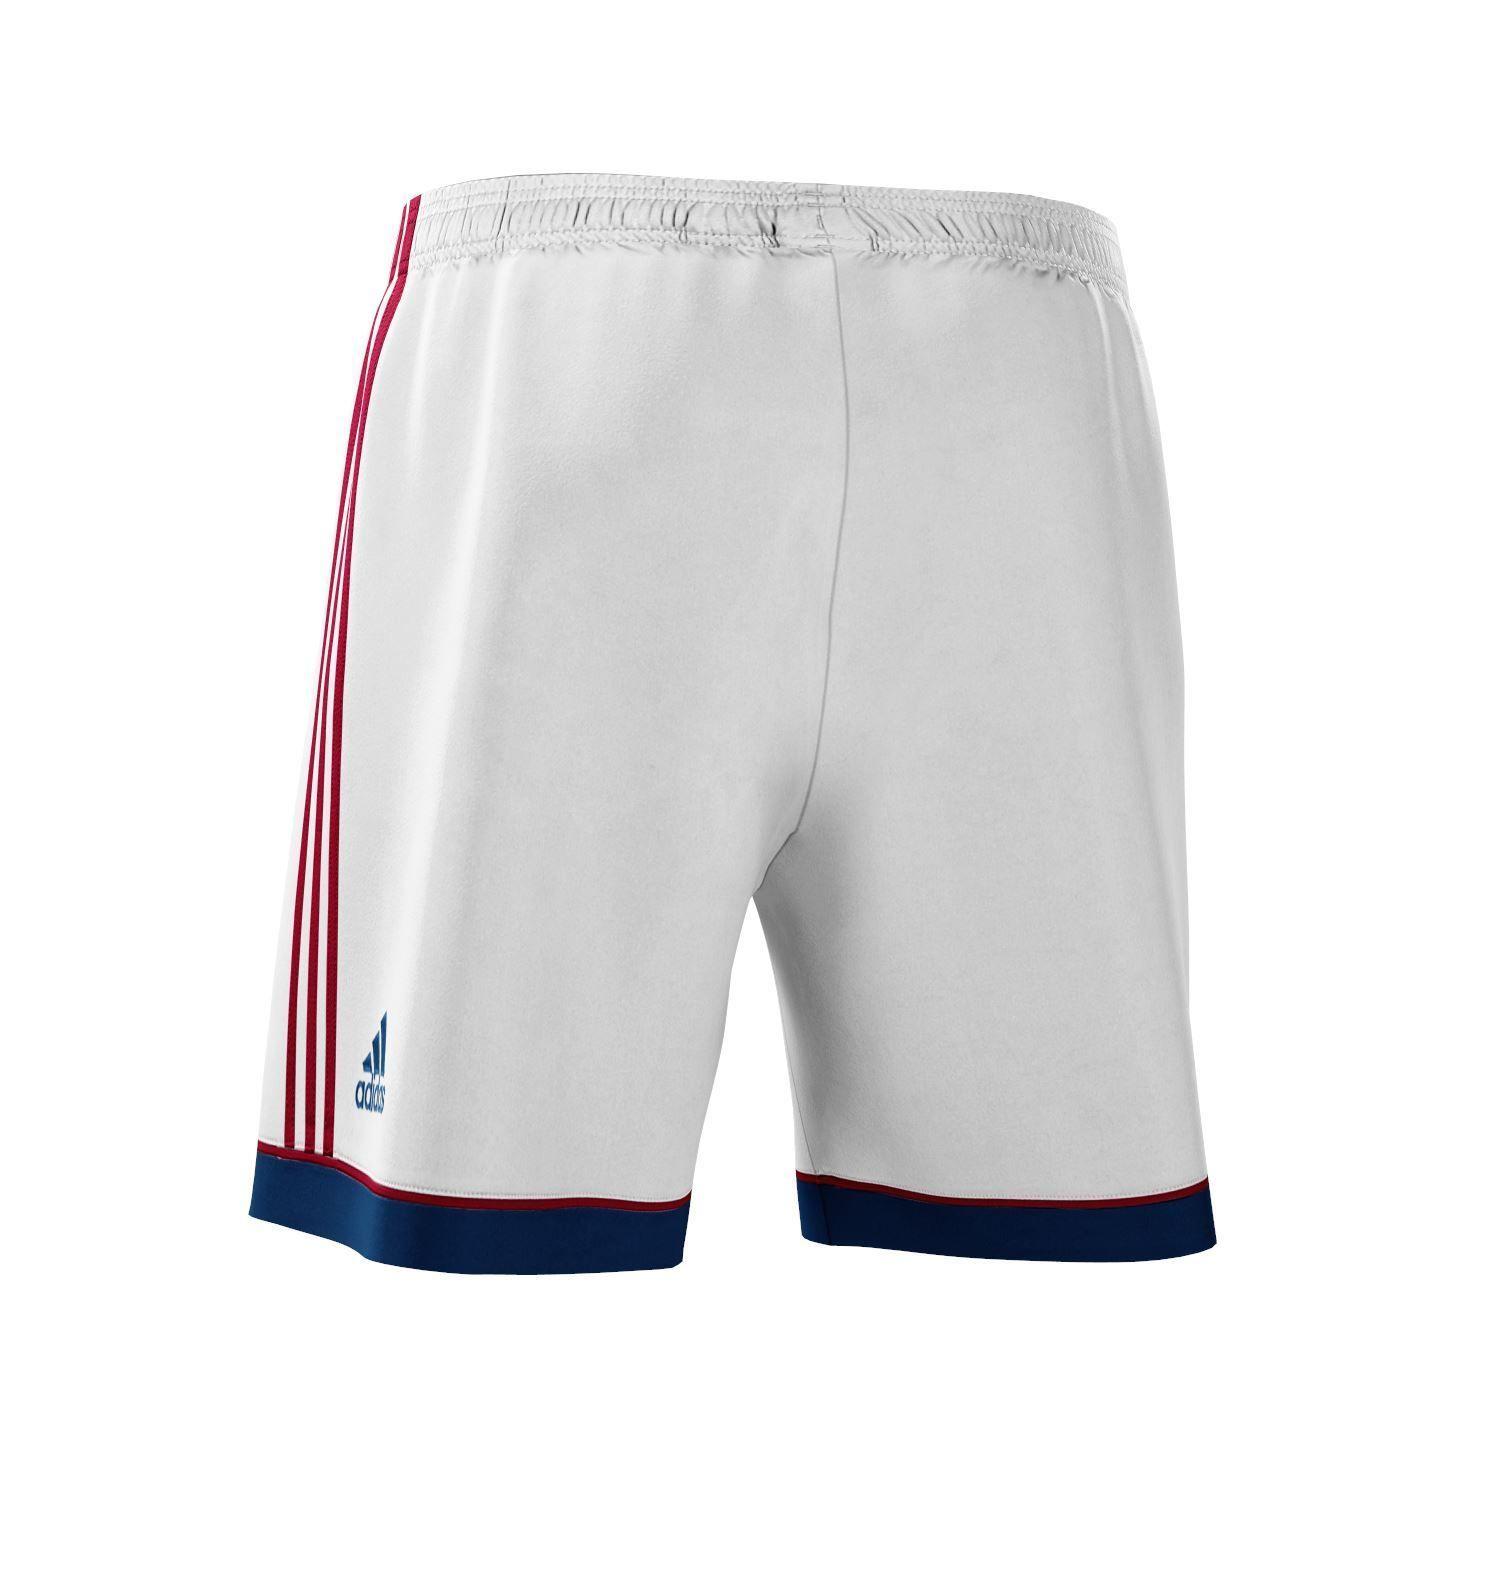 GPS miSquadra 17 Custom Shorts - Womens Large ( $1.38) in 2021 ...